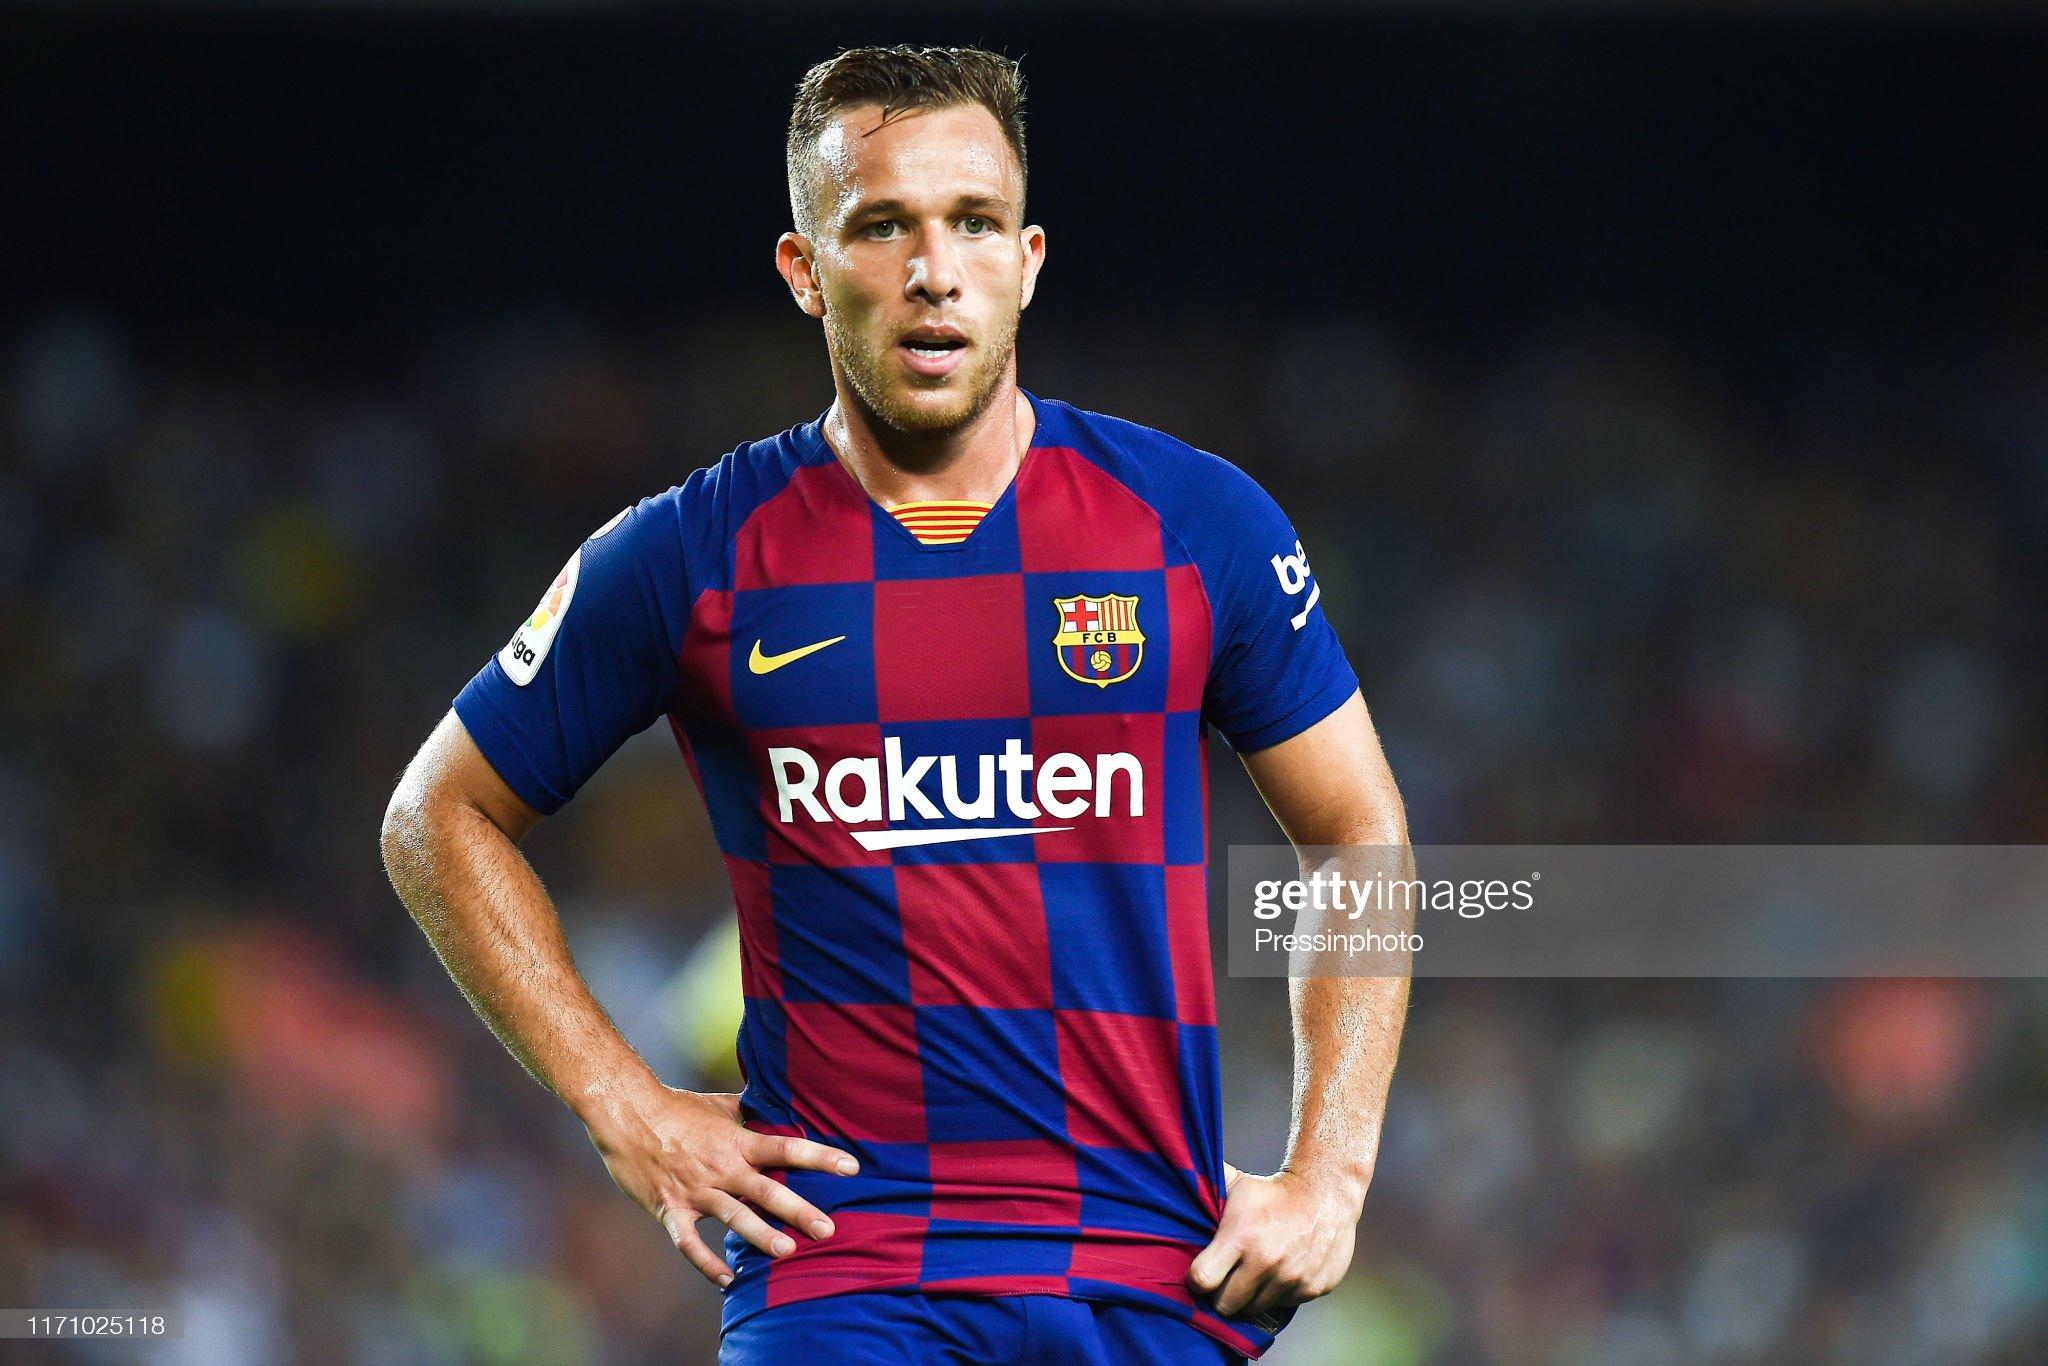 صور مباراة : برشلونة - فياريال 2-1 ( 24-09-2019 )  Arthur-melo-of-fc-barcelona-during-the-liga-match-between-barcelona-picture-id1171025118?s=2048x2048